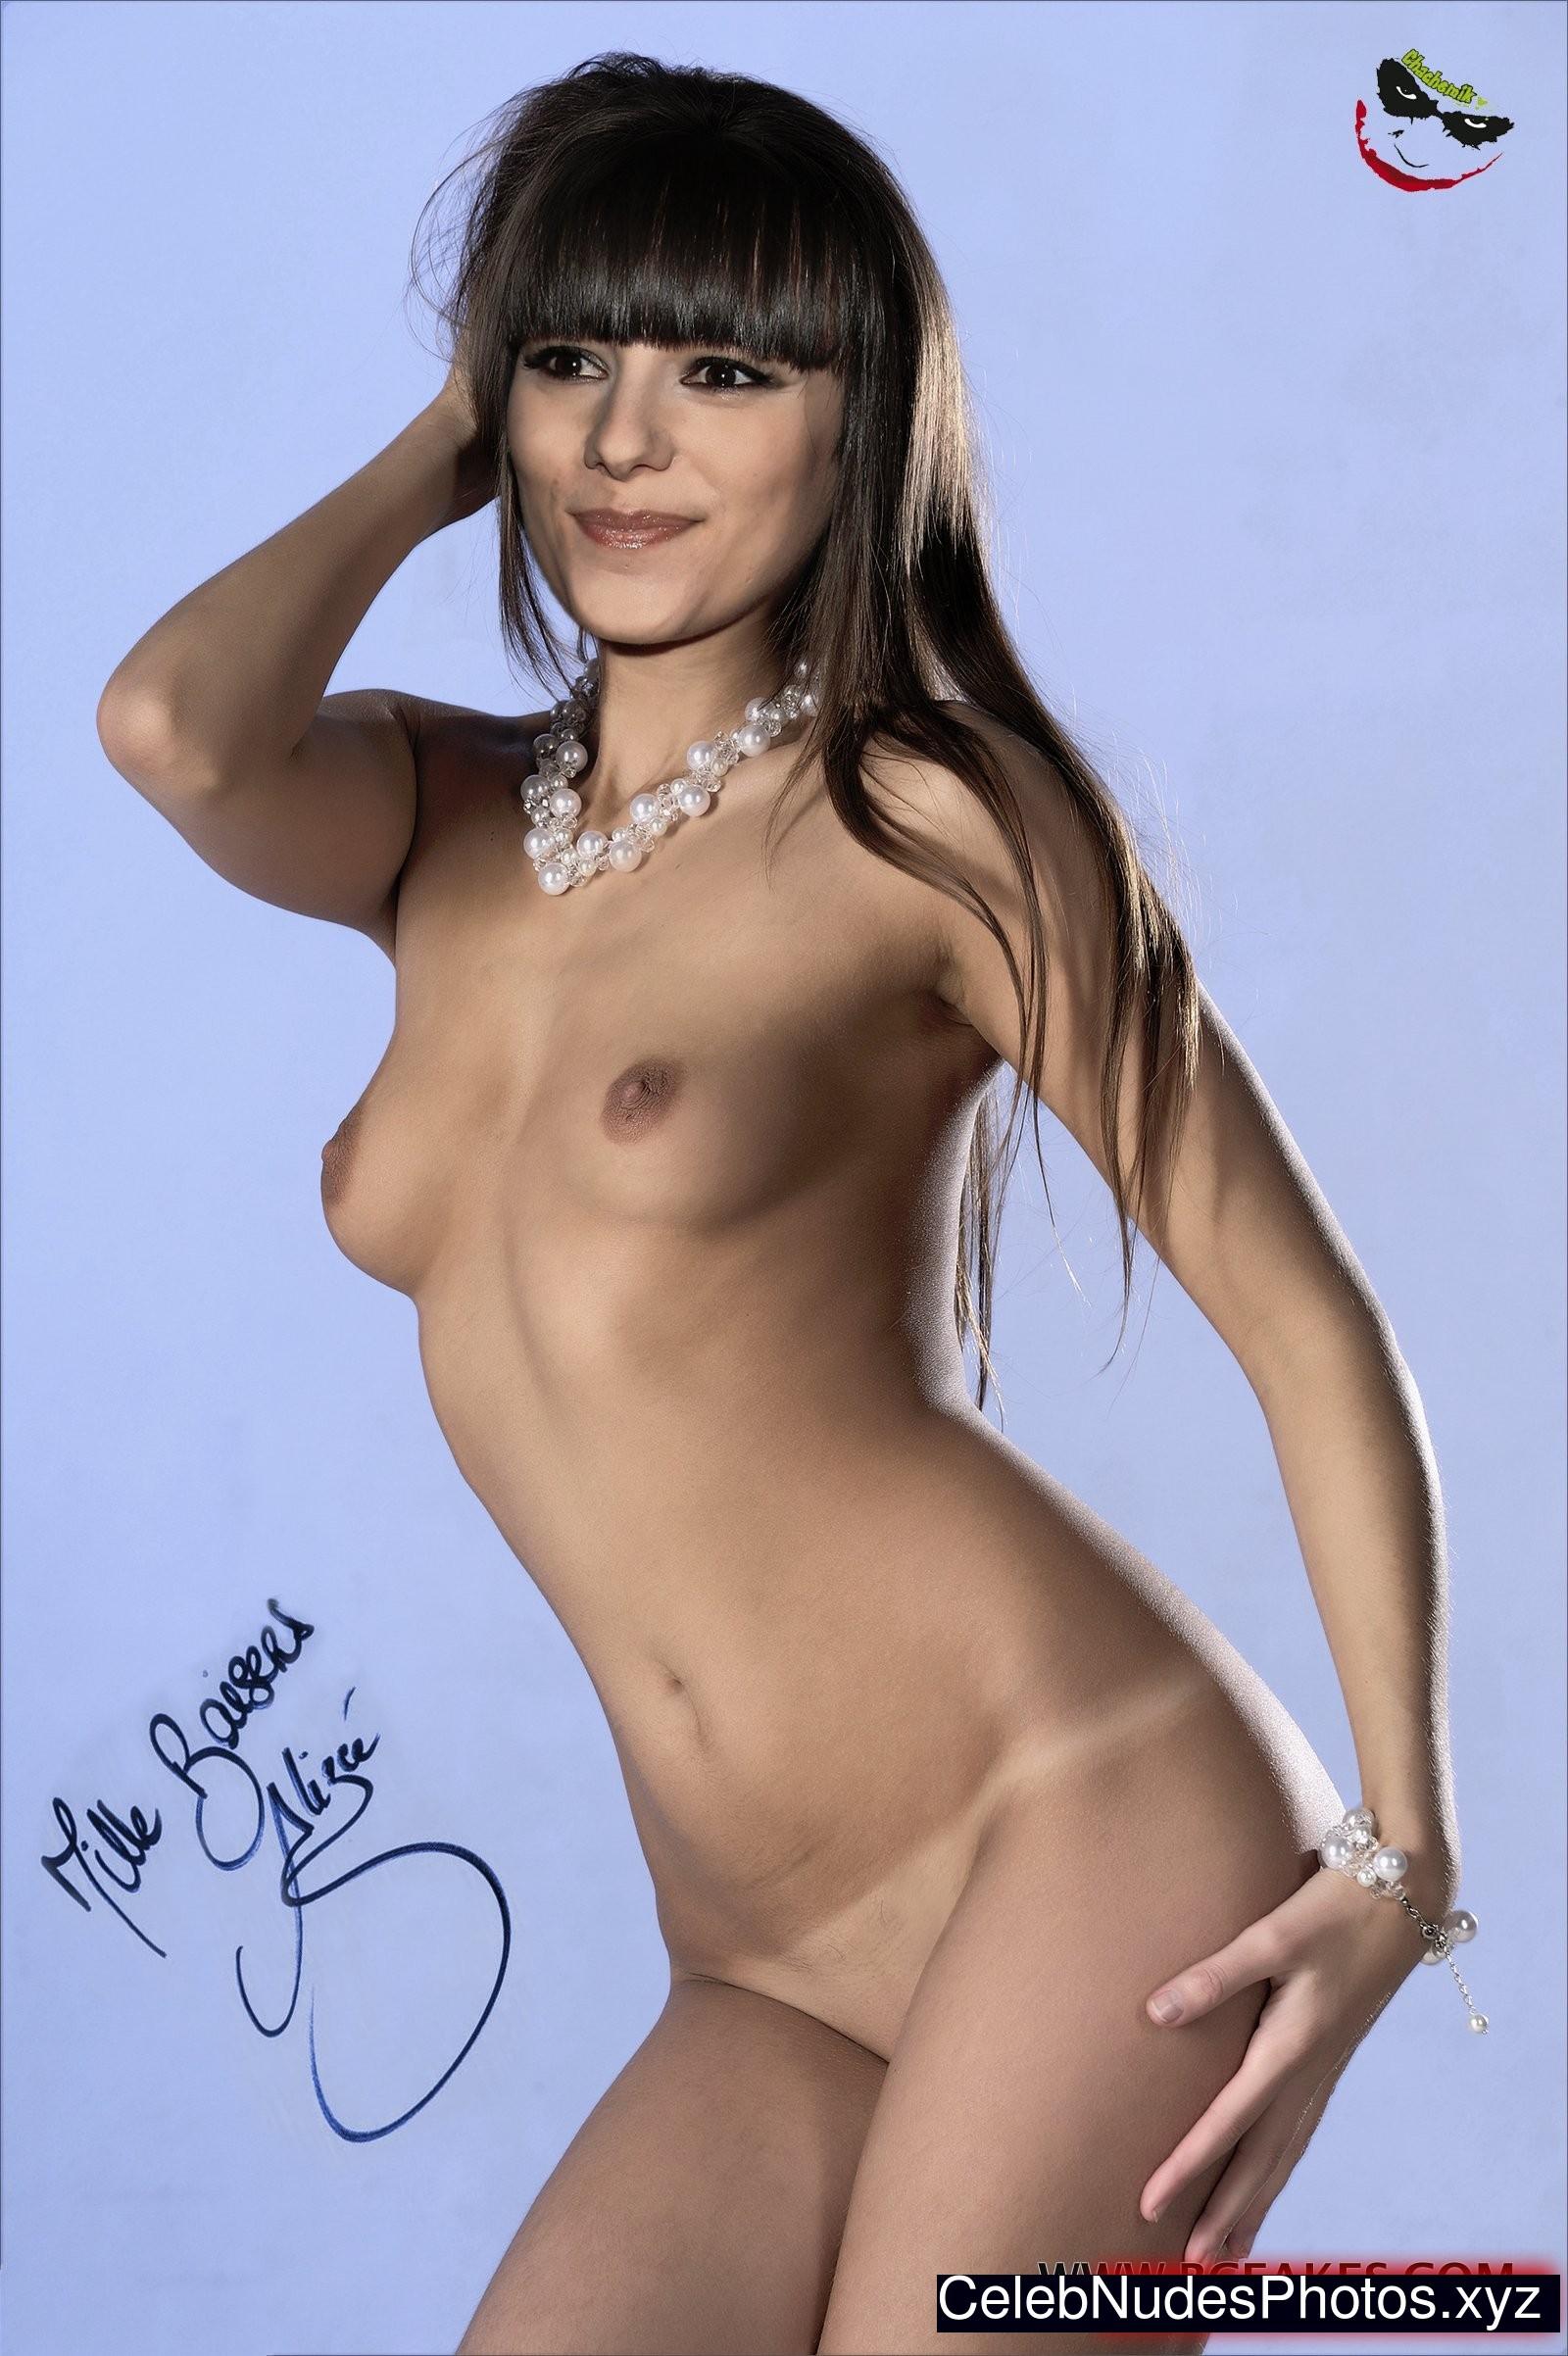 Tits Alizee Nude Jpg